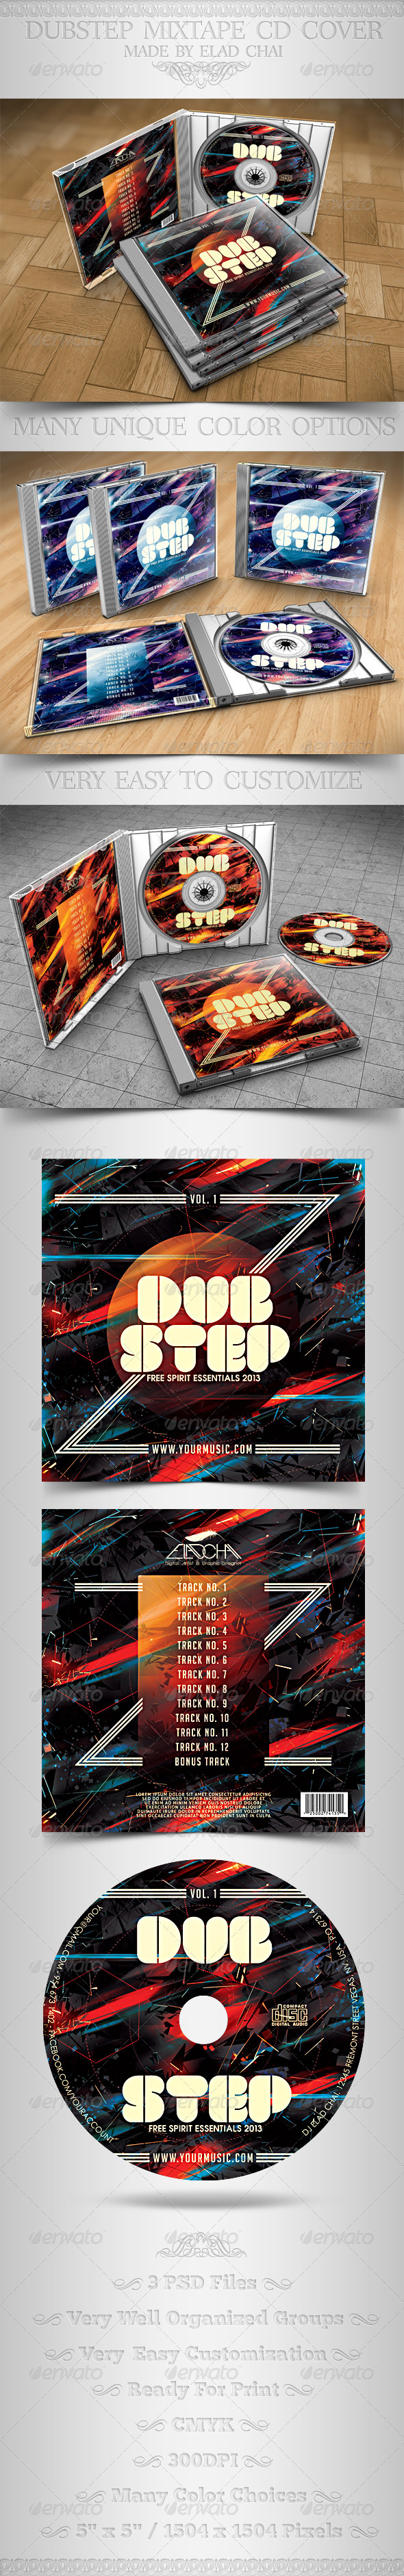 Dubstep Mixtape CD Cover Insert & Label - CD & DVD Artwork Print Templates